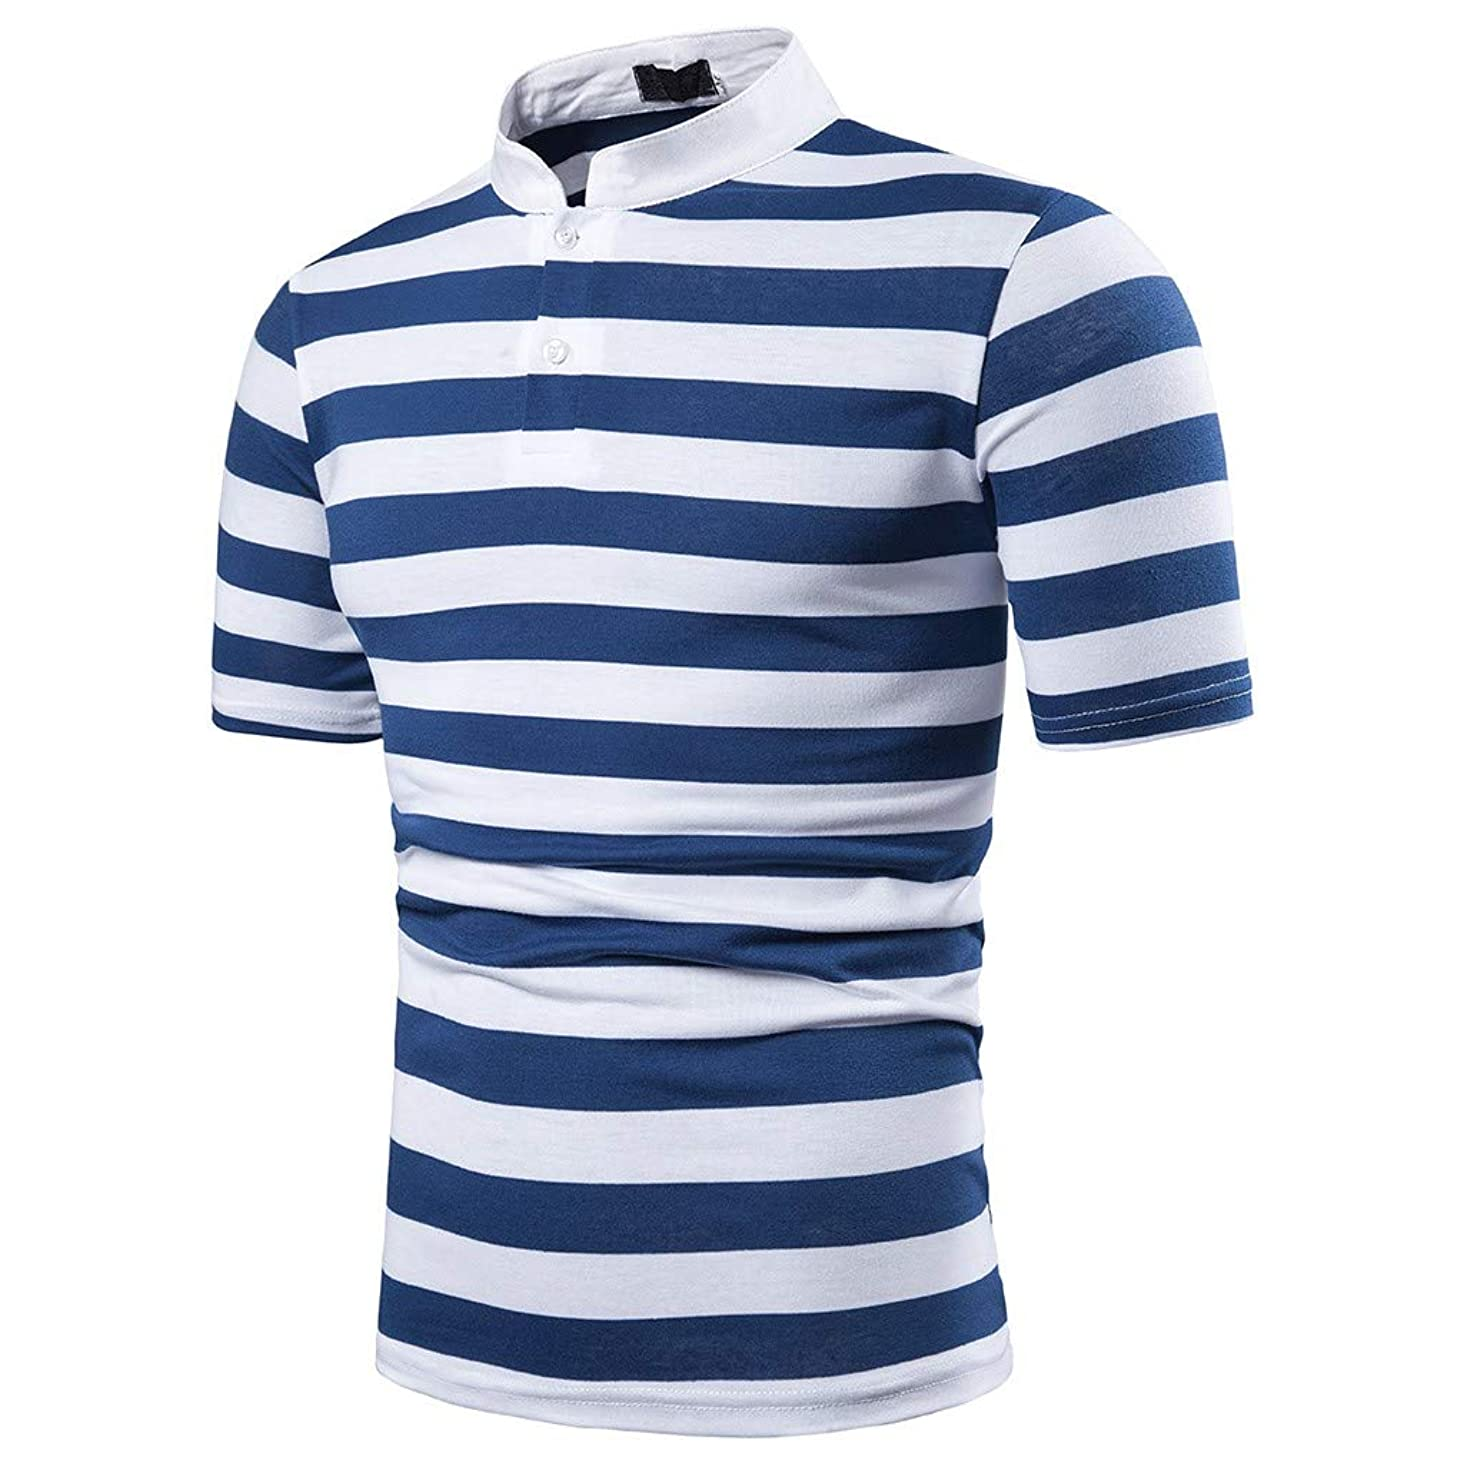 Men's Short Collar Polo Shirt,MmNote Textured Design Classic Pique Slim Fit Elastic Antibacterial Classic Fit T-Shirt